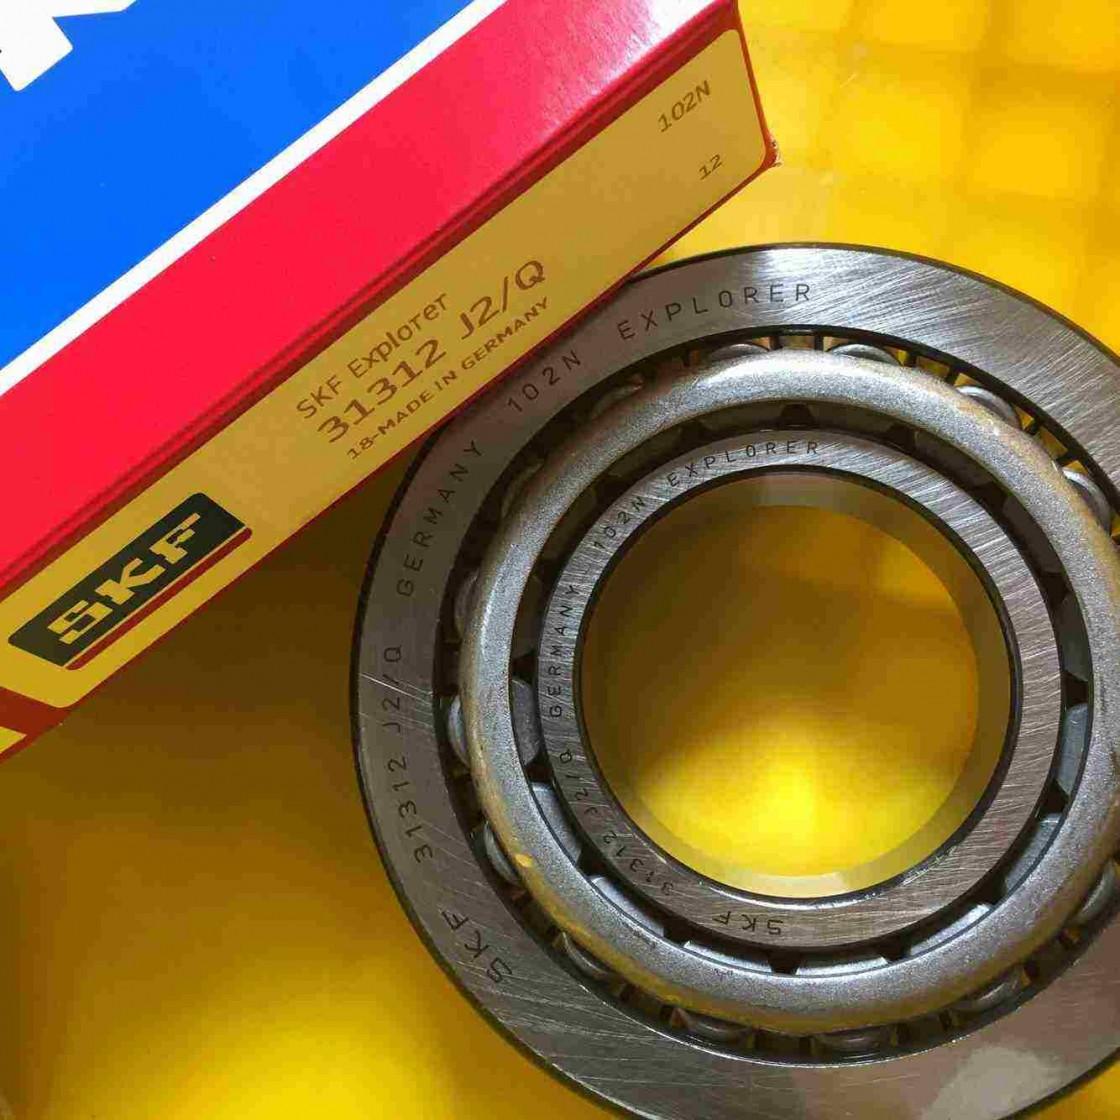 rsr 6006  Cylindrical Roller Bearings